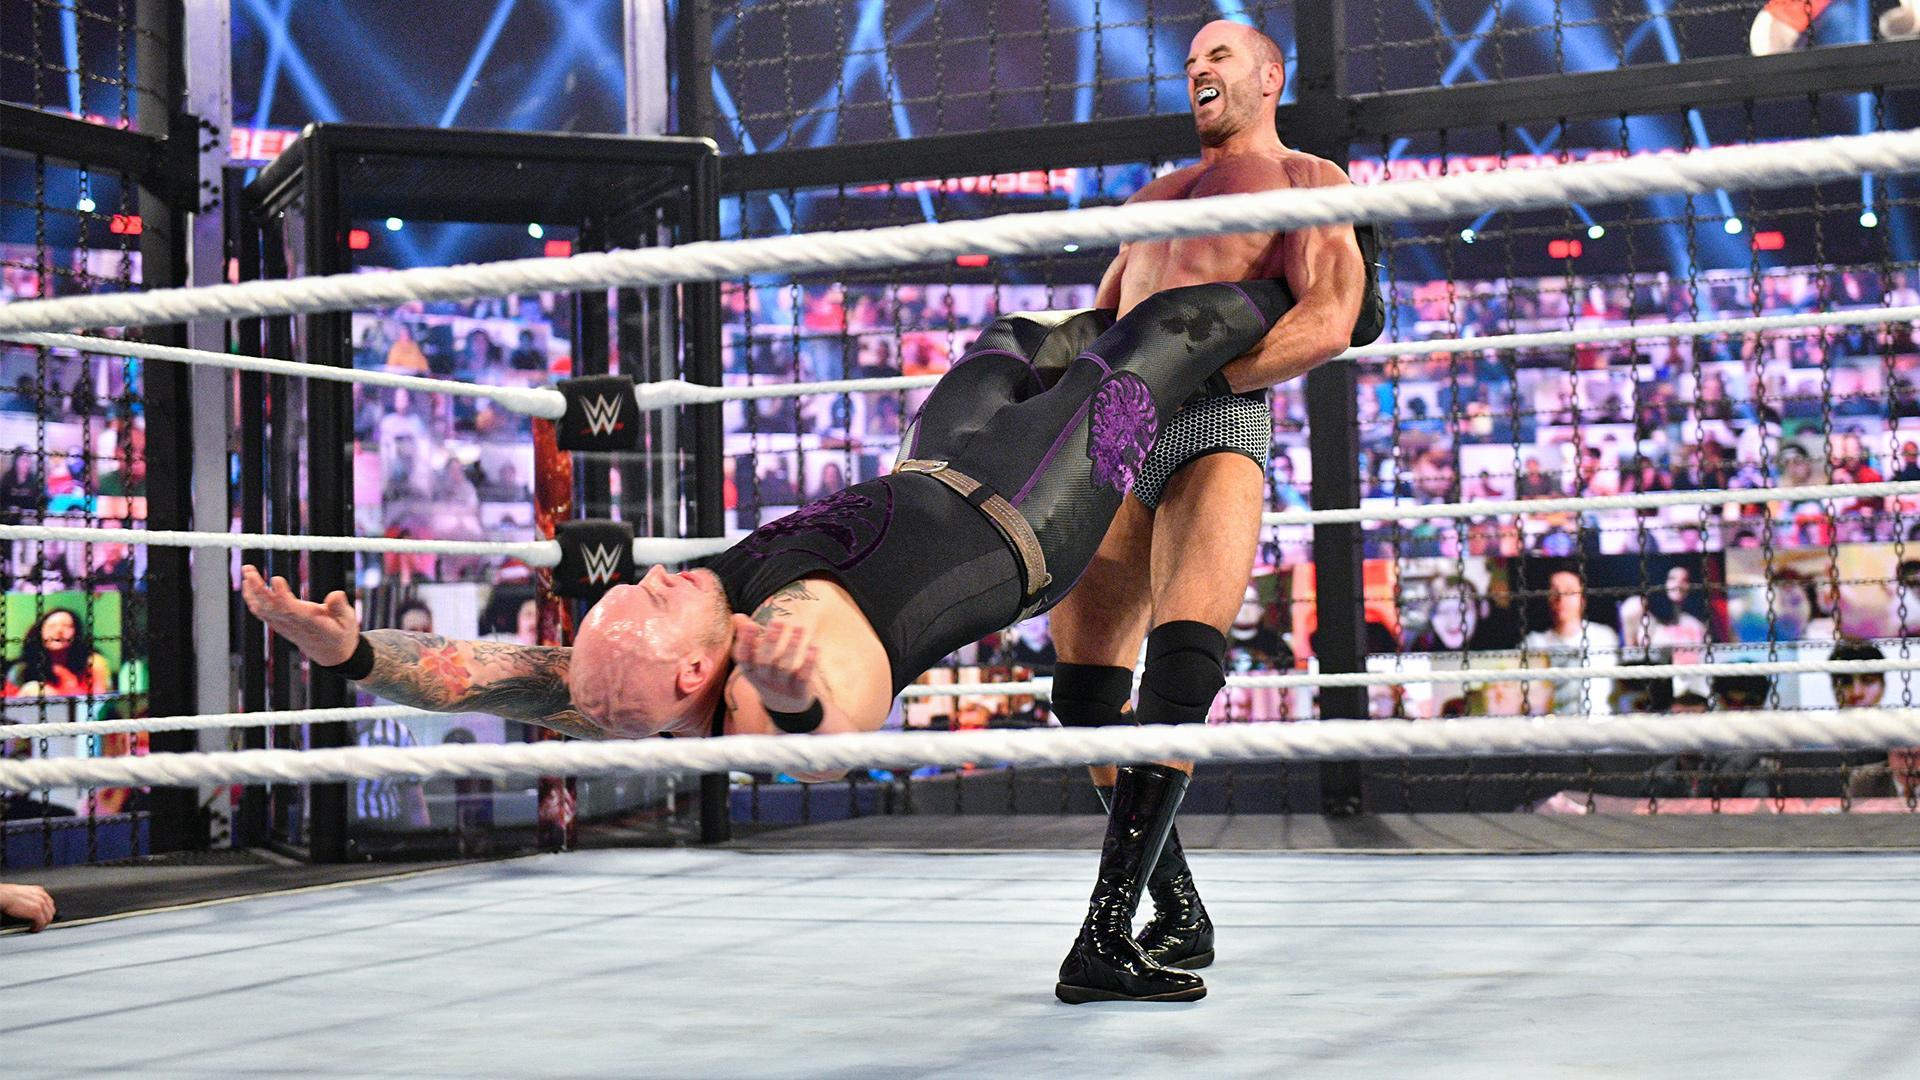 Cobertura: WWE Elimination Chamber 2021 – Awesome!